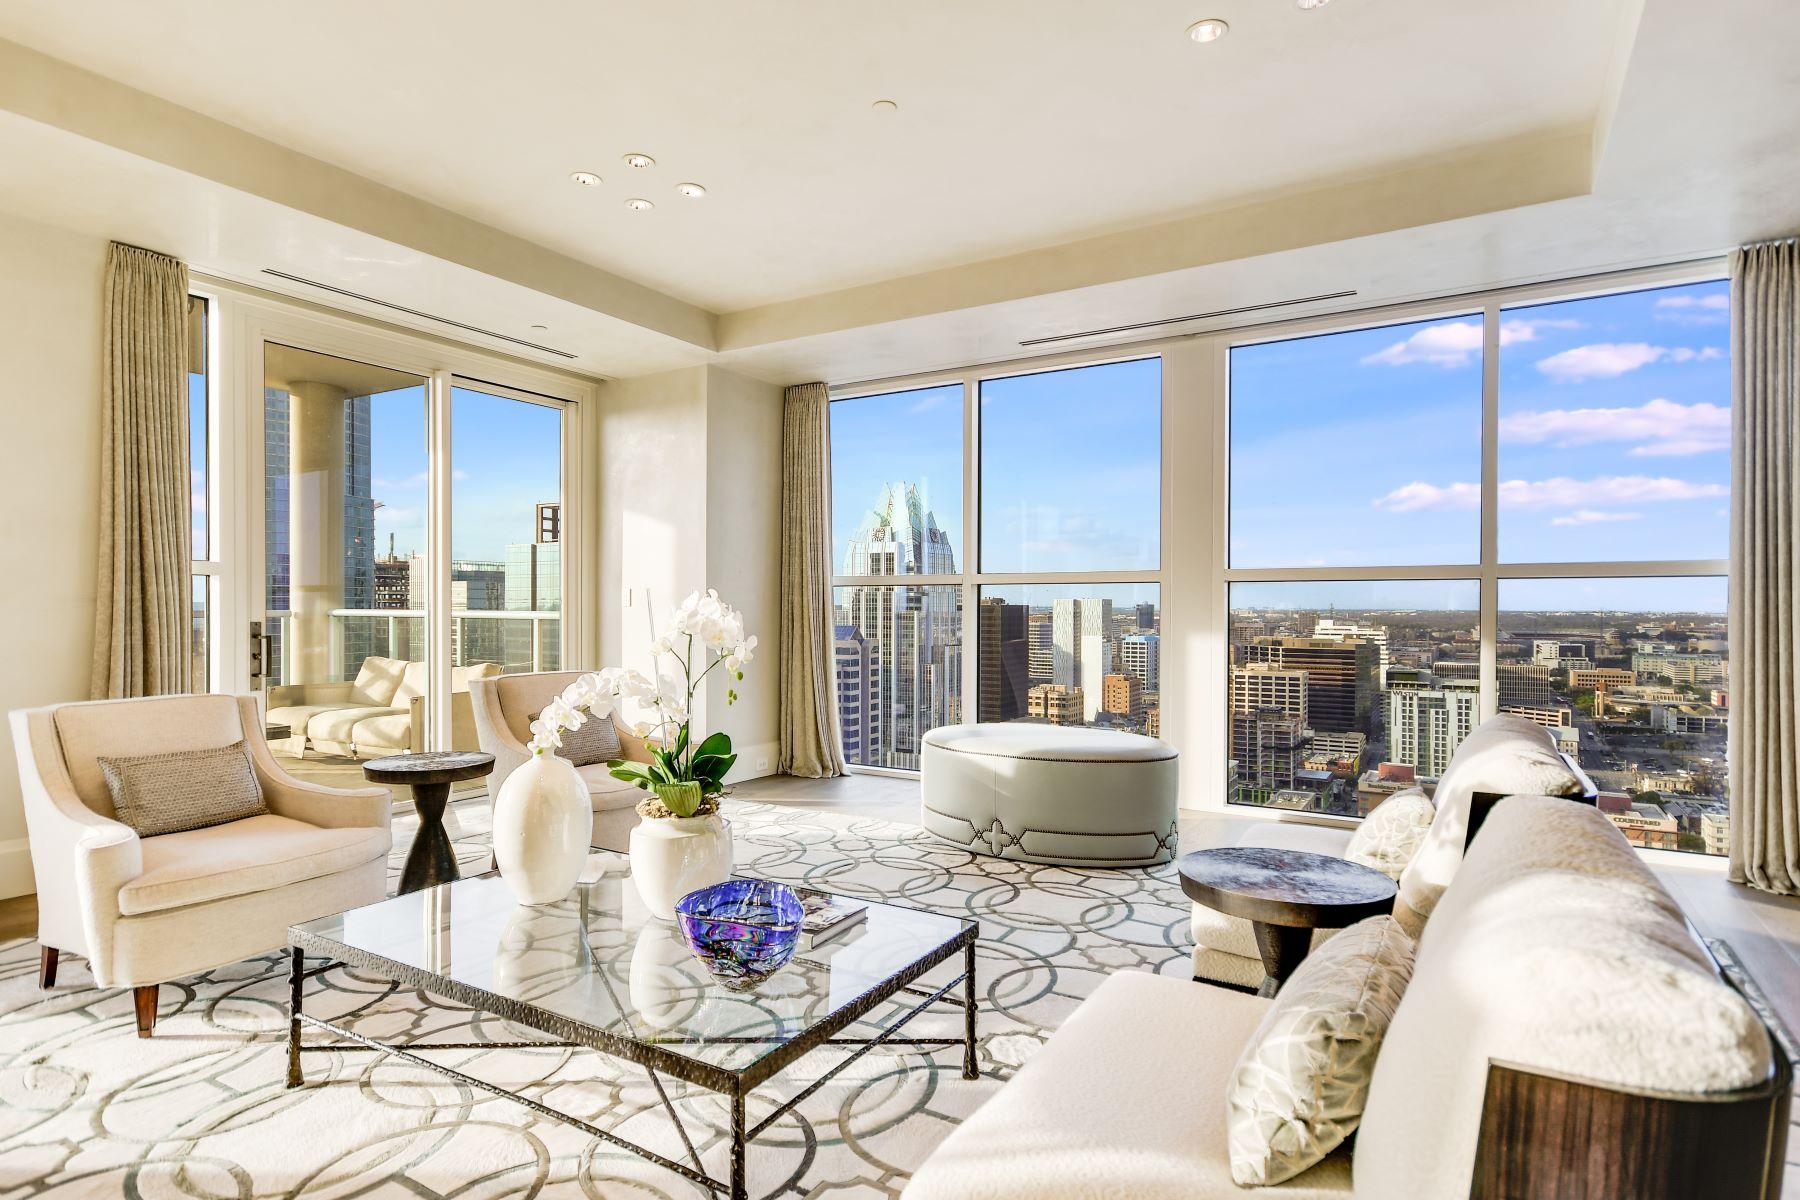 Condominiums for Sale at The Four Seasons, 30th Floor Penthouse 98 San Jacinto Boulevard, 30th Floor Penthouse Austin, Texas 78701 United States